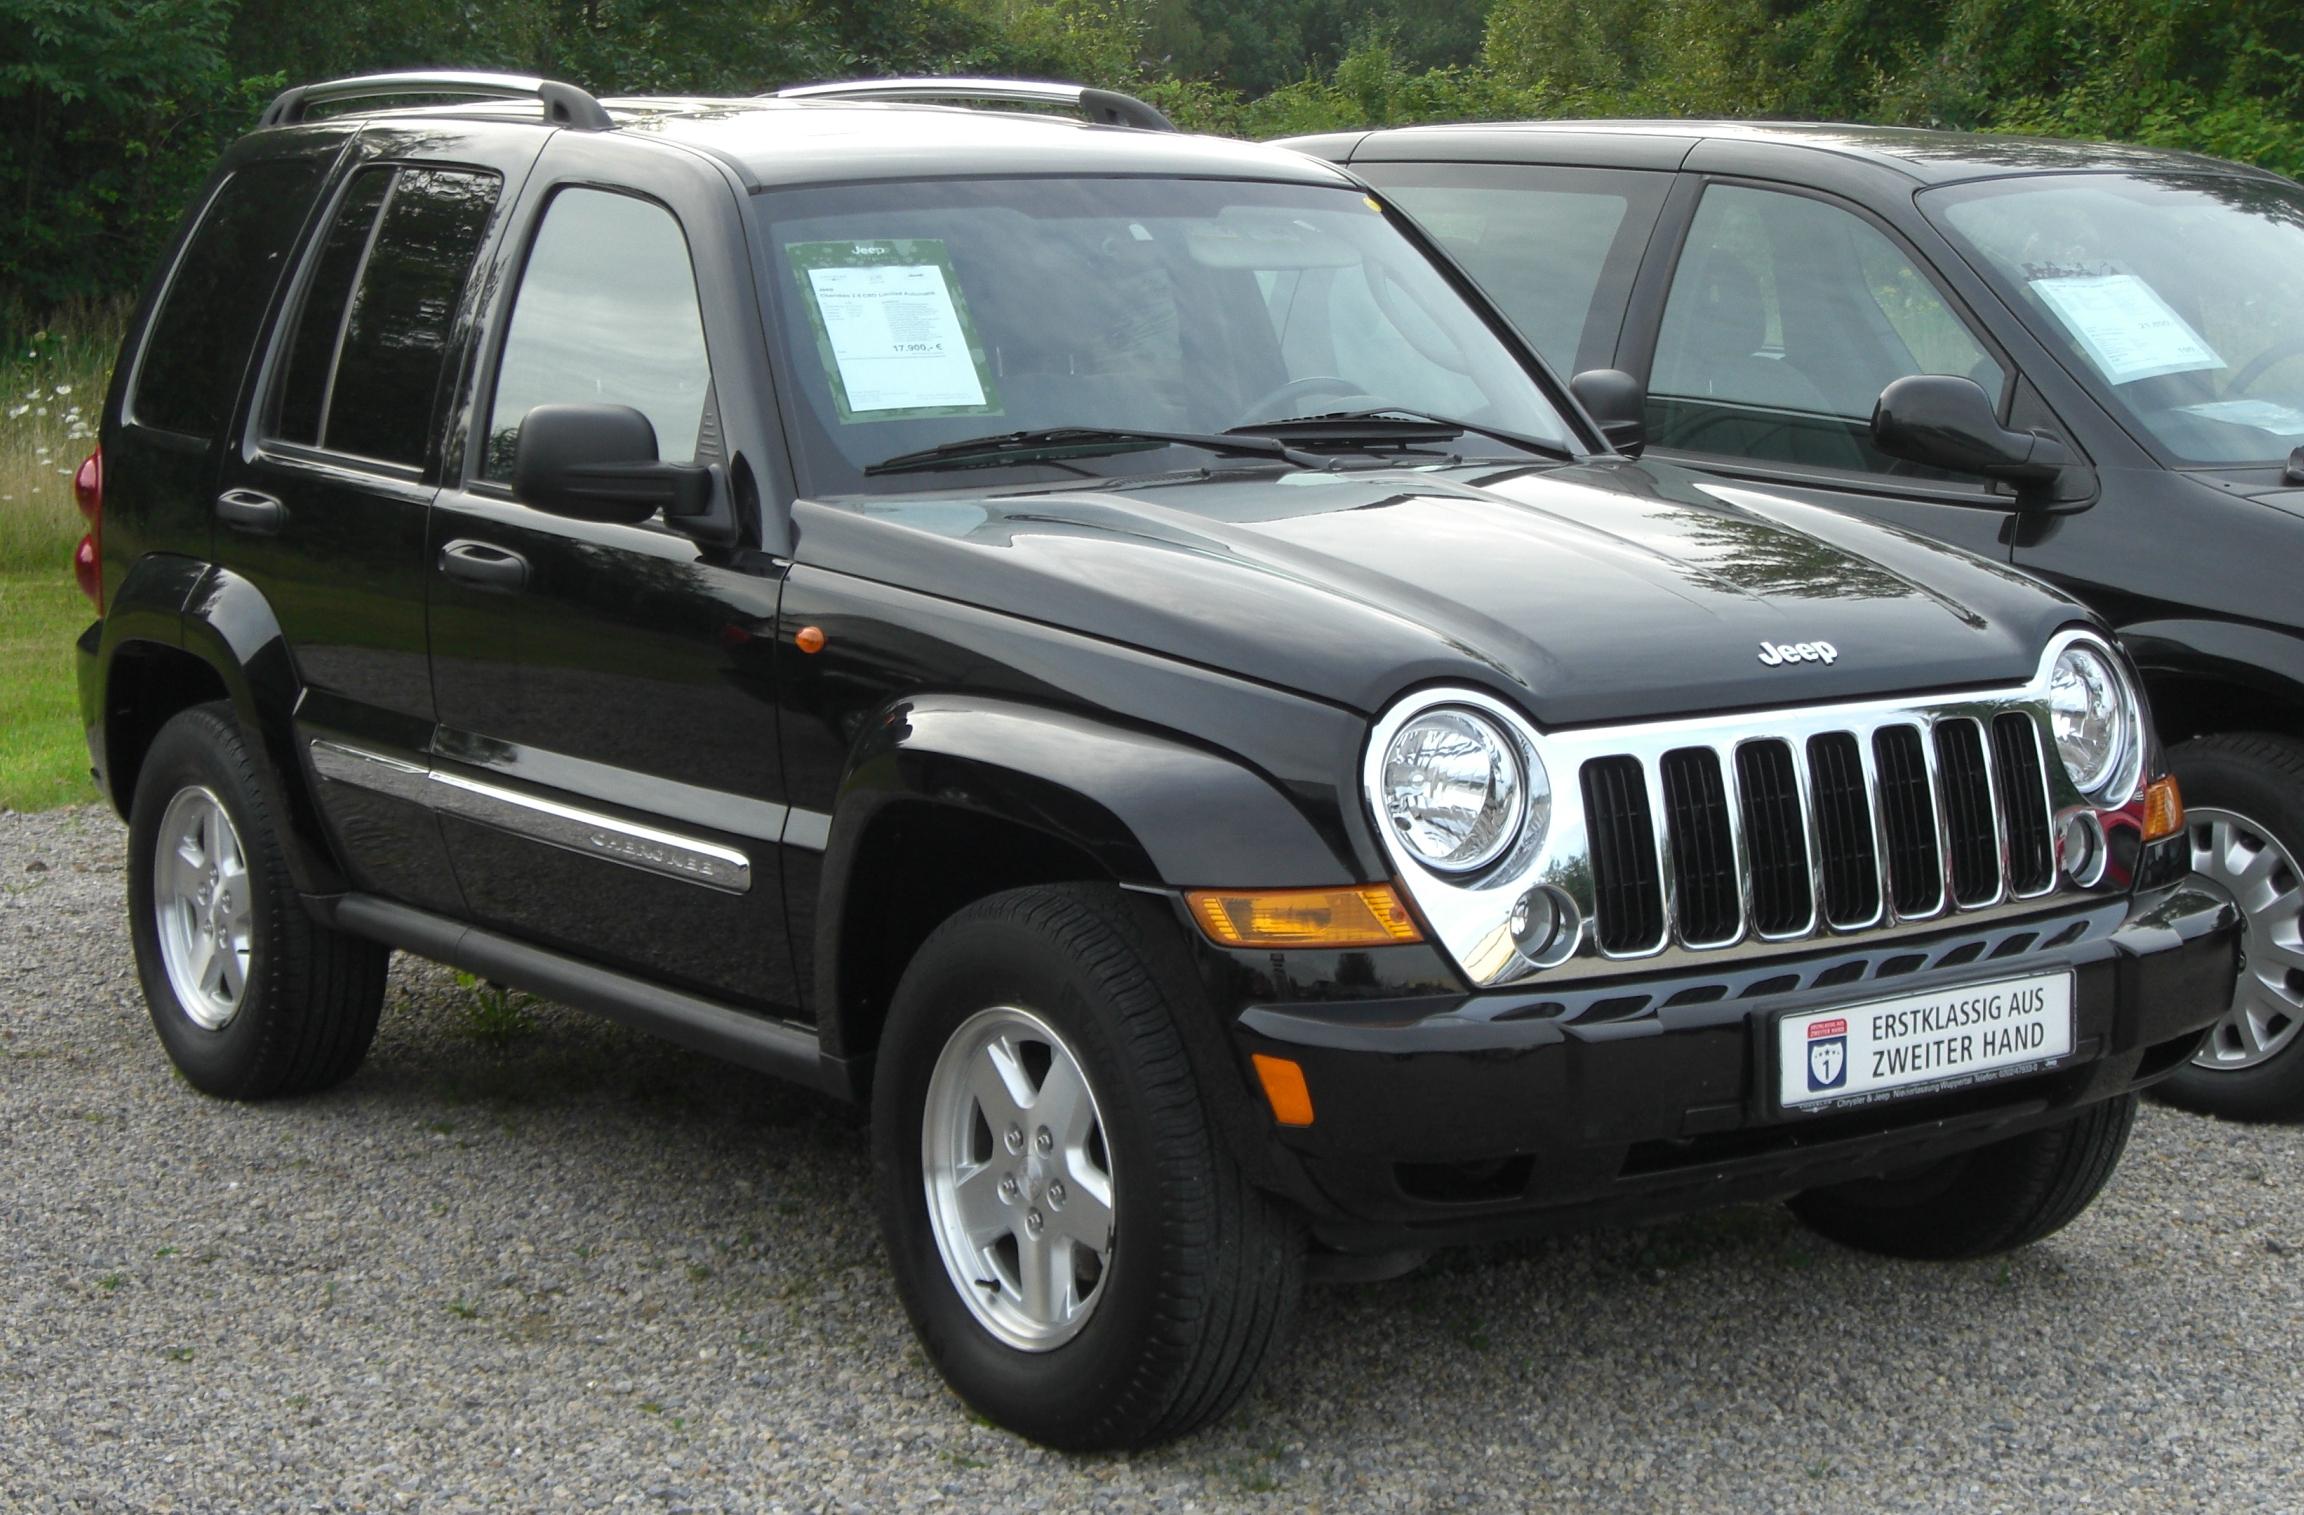 Jeep cherokee 2.8 crd 2008